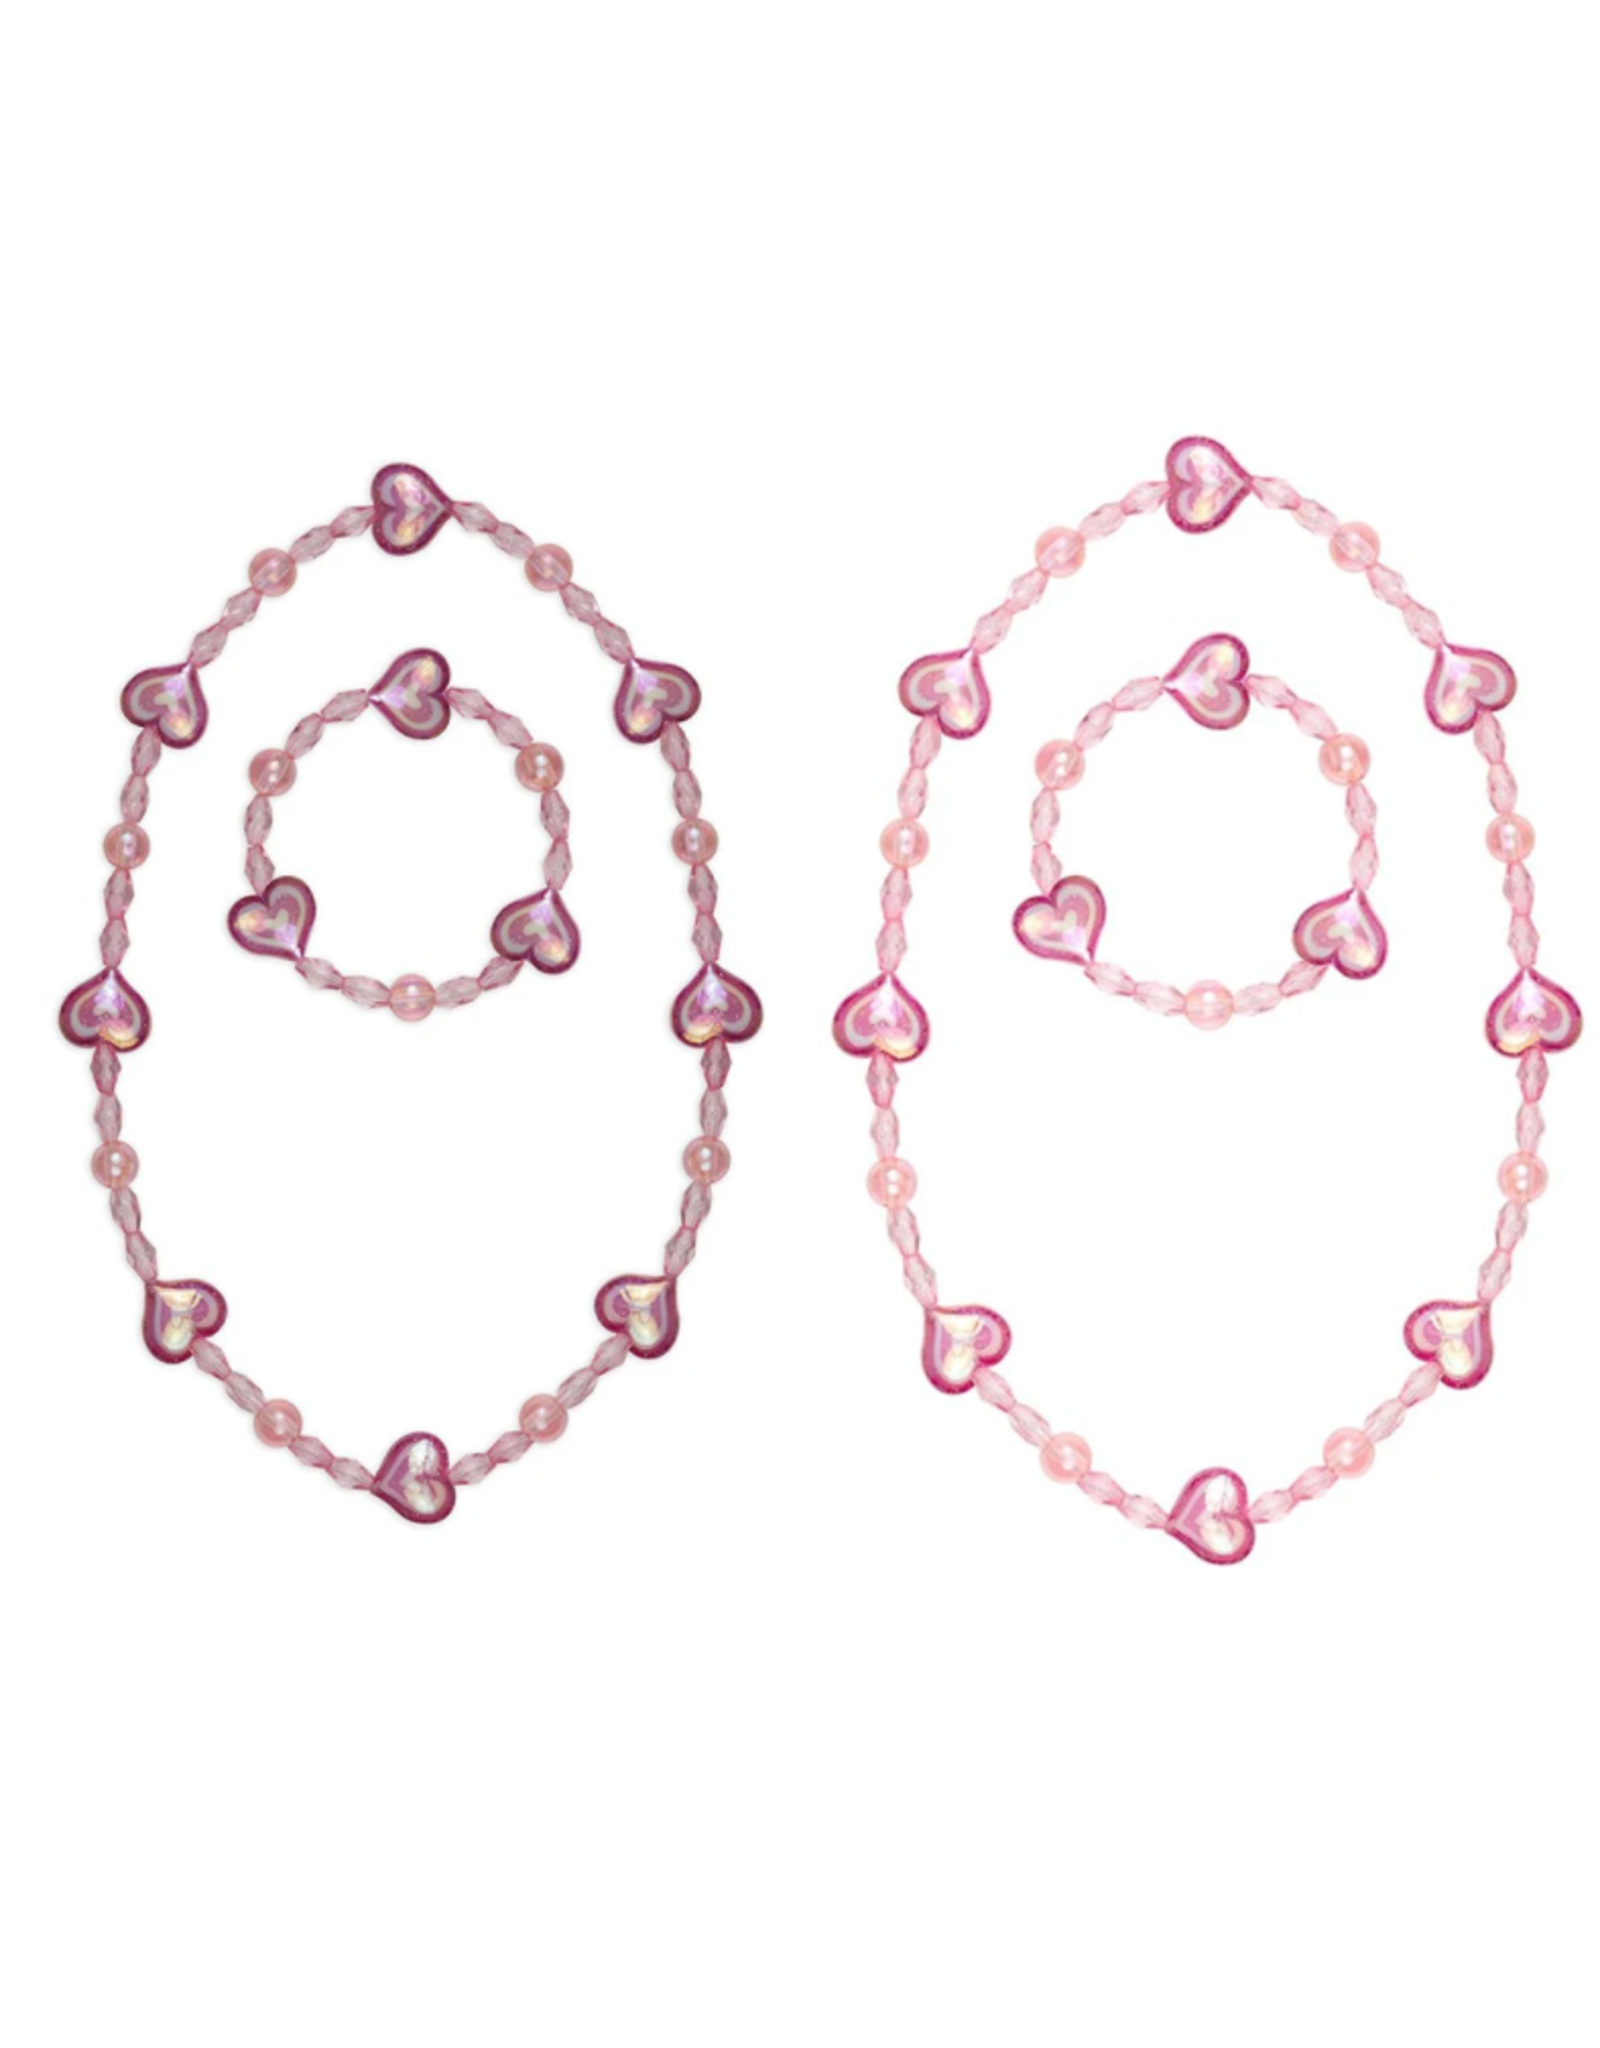 Great Pretenders Cotton Candy Necklace & Bracelet Set